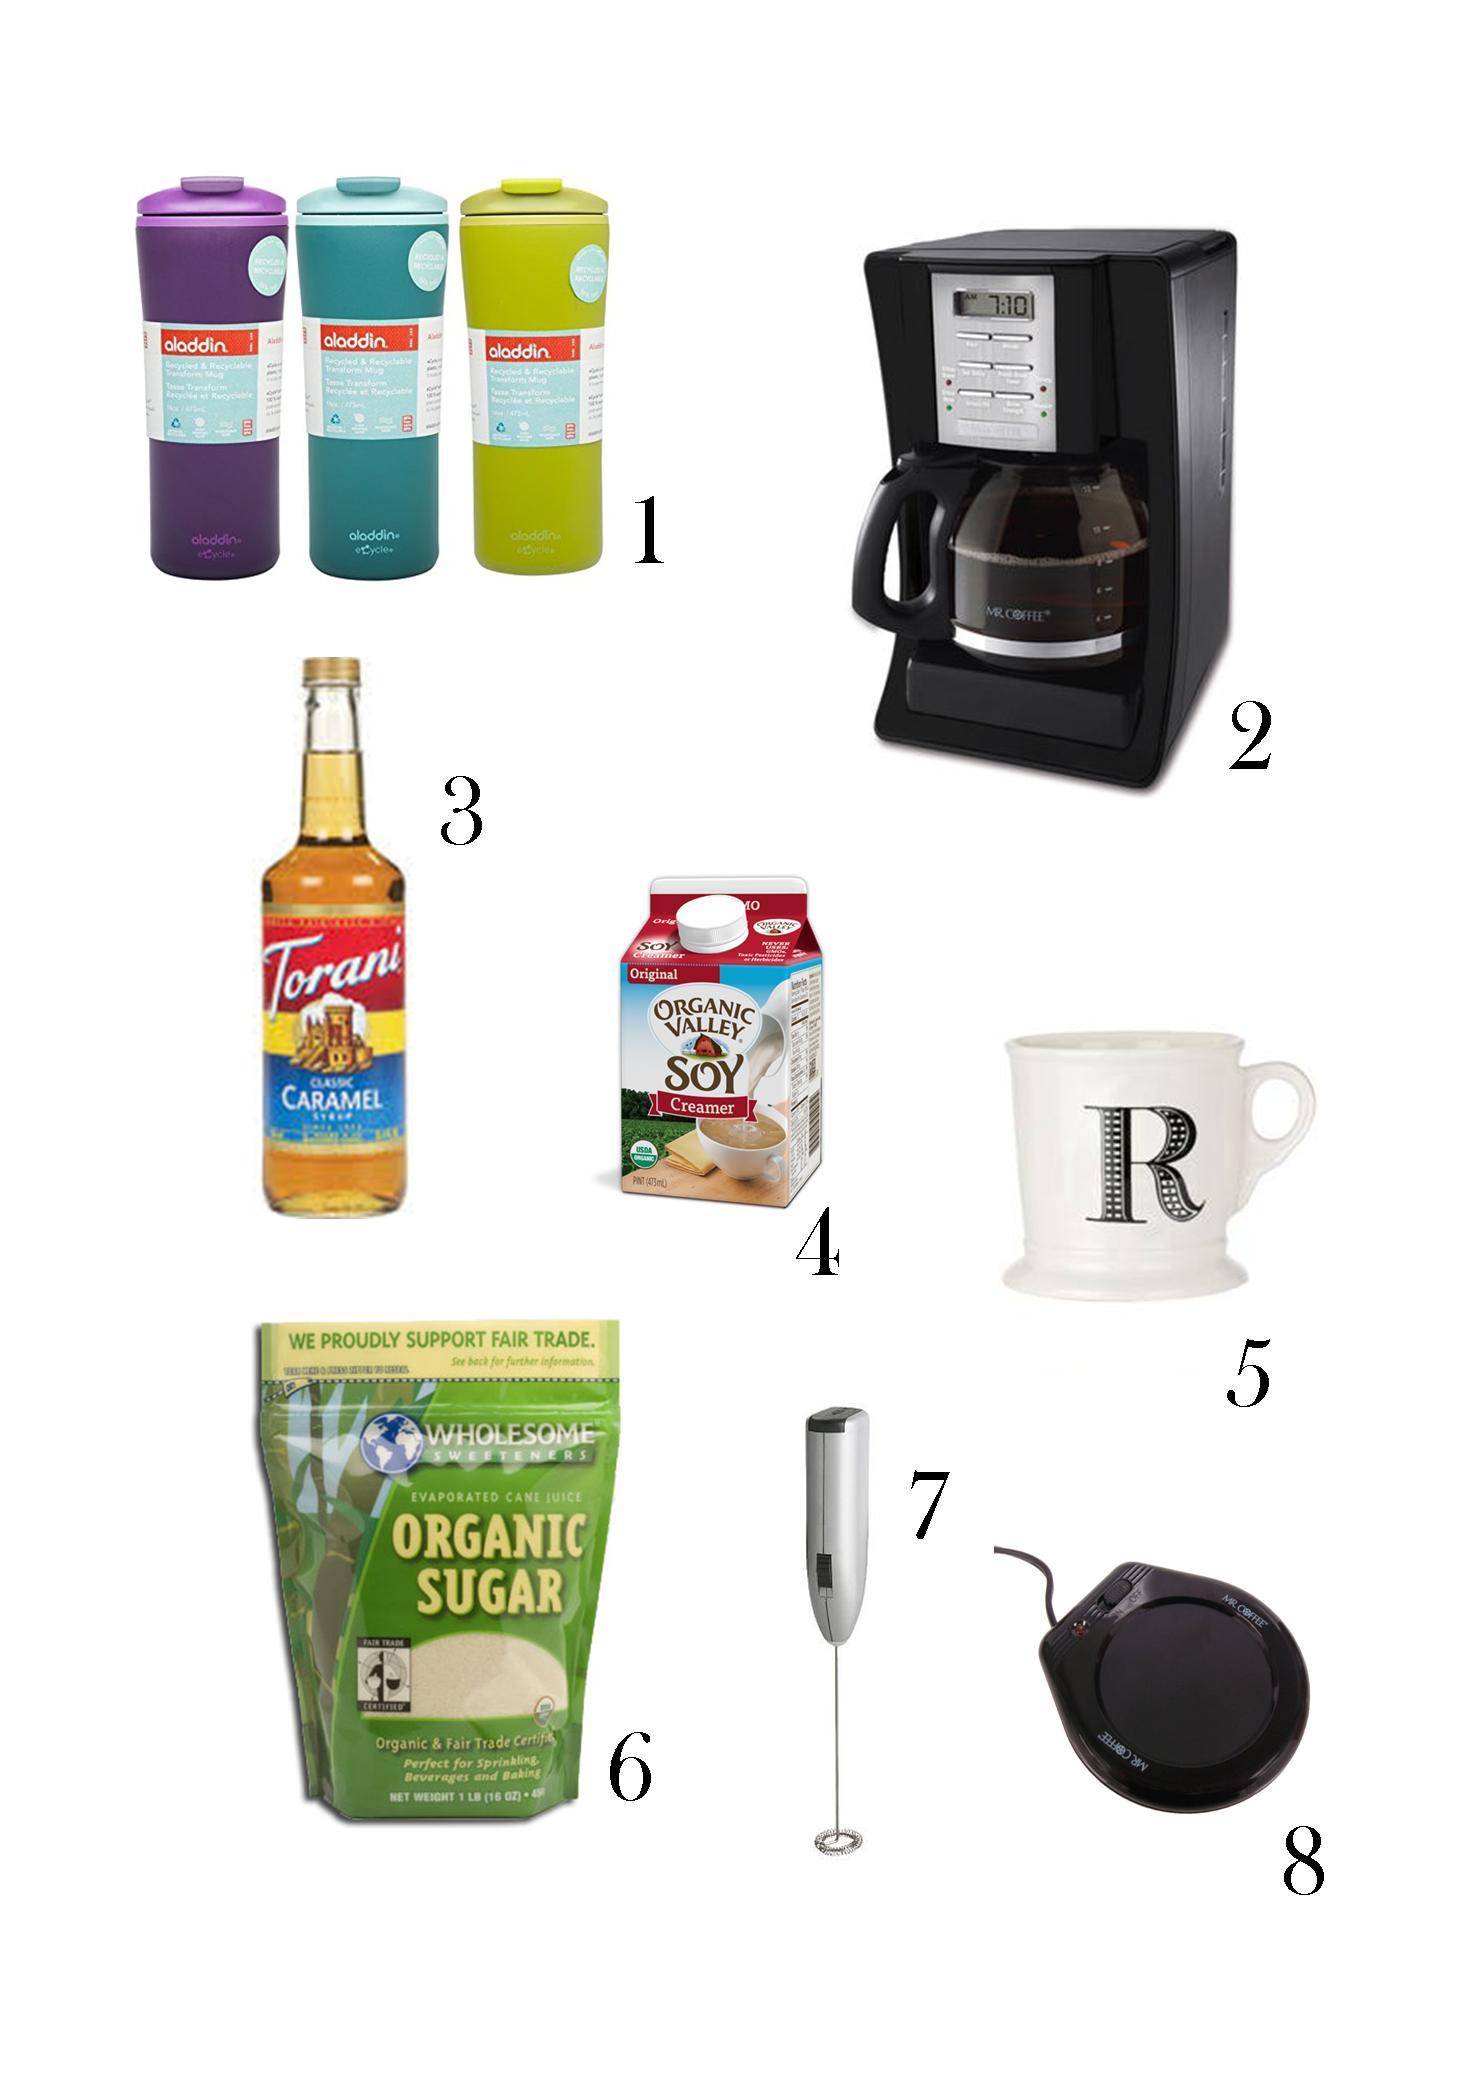 Amazon aladdin coffee mugs - Xmas Coffee 1 Aladdin Mug From Amazon